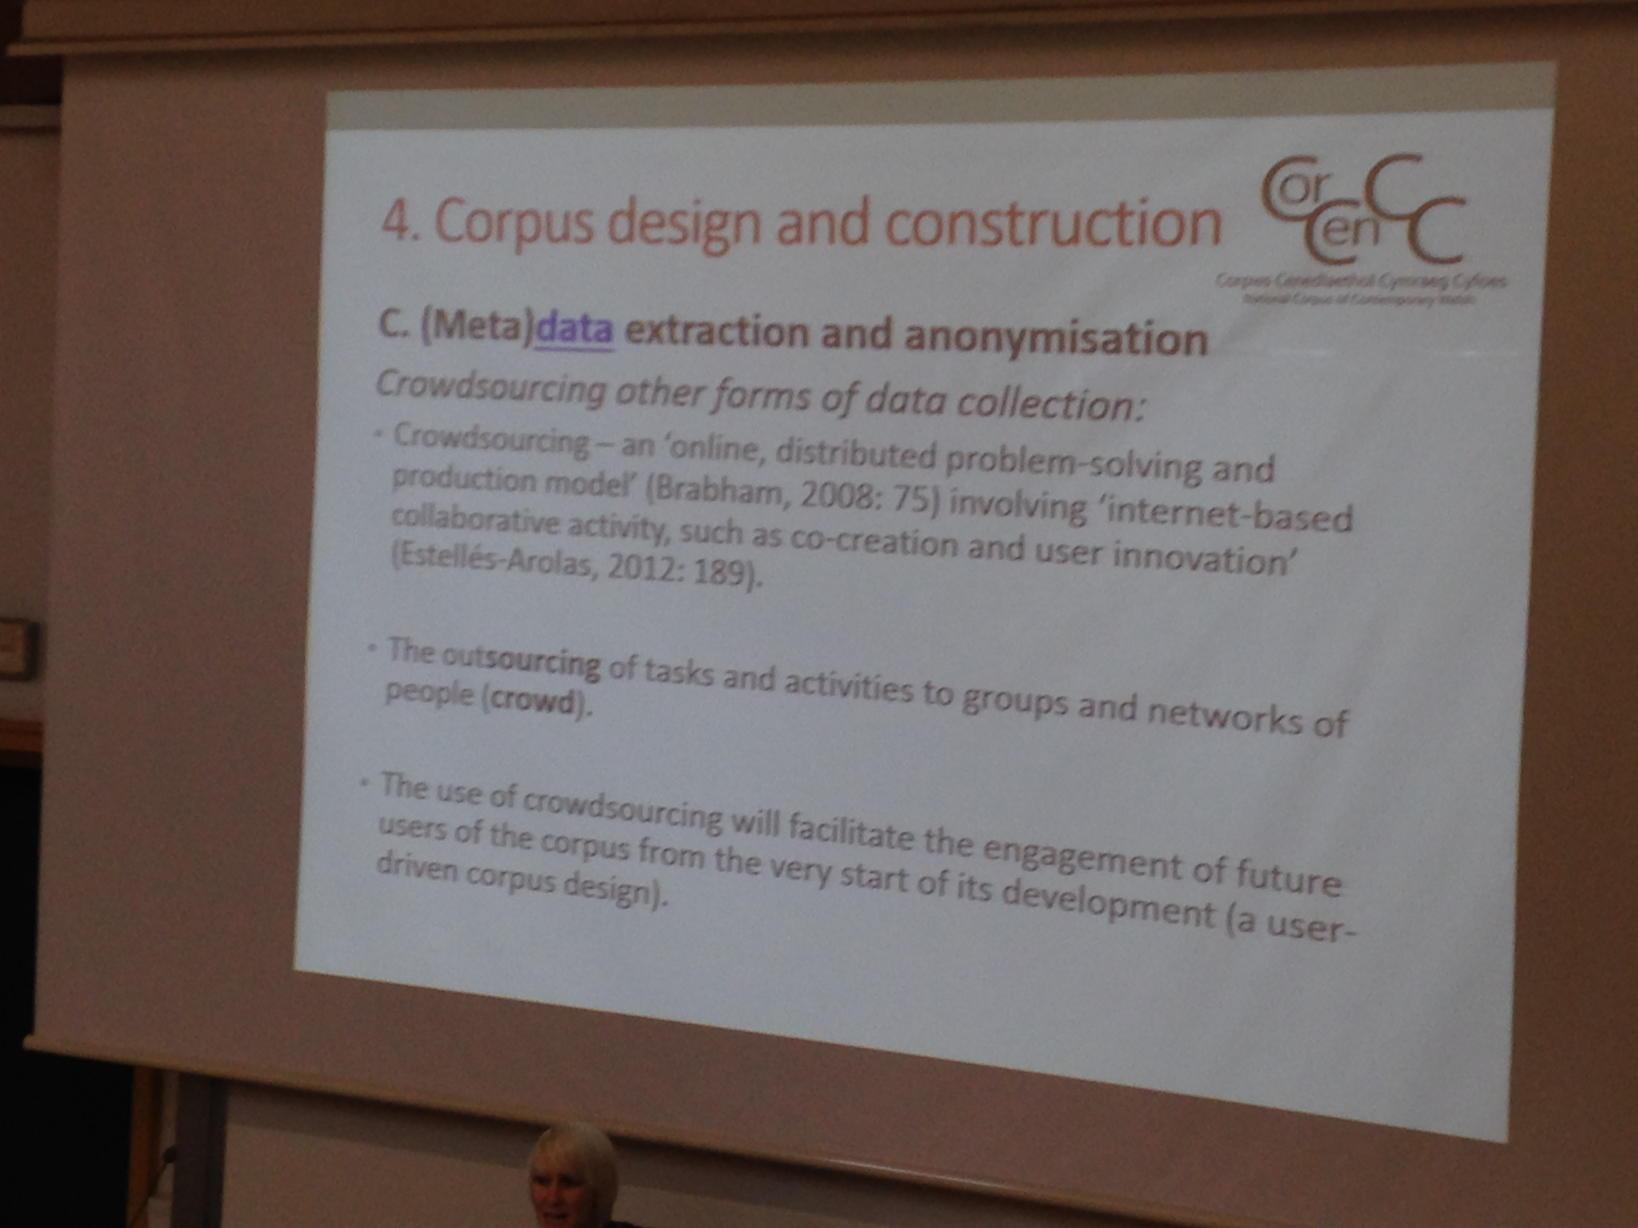 Usine crowdsourcing for CMC corpora #cmccorpora16 https://t.co/da1MrVw6Kl